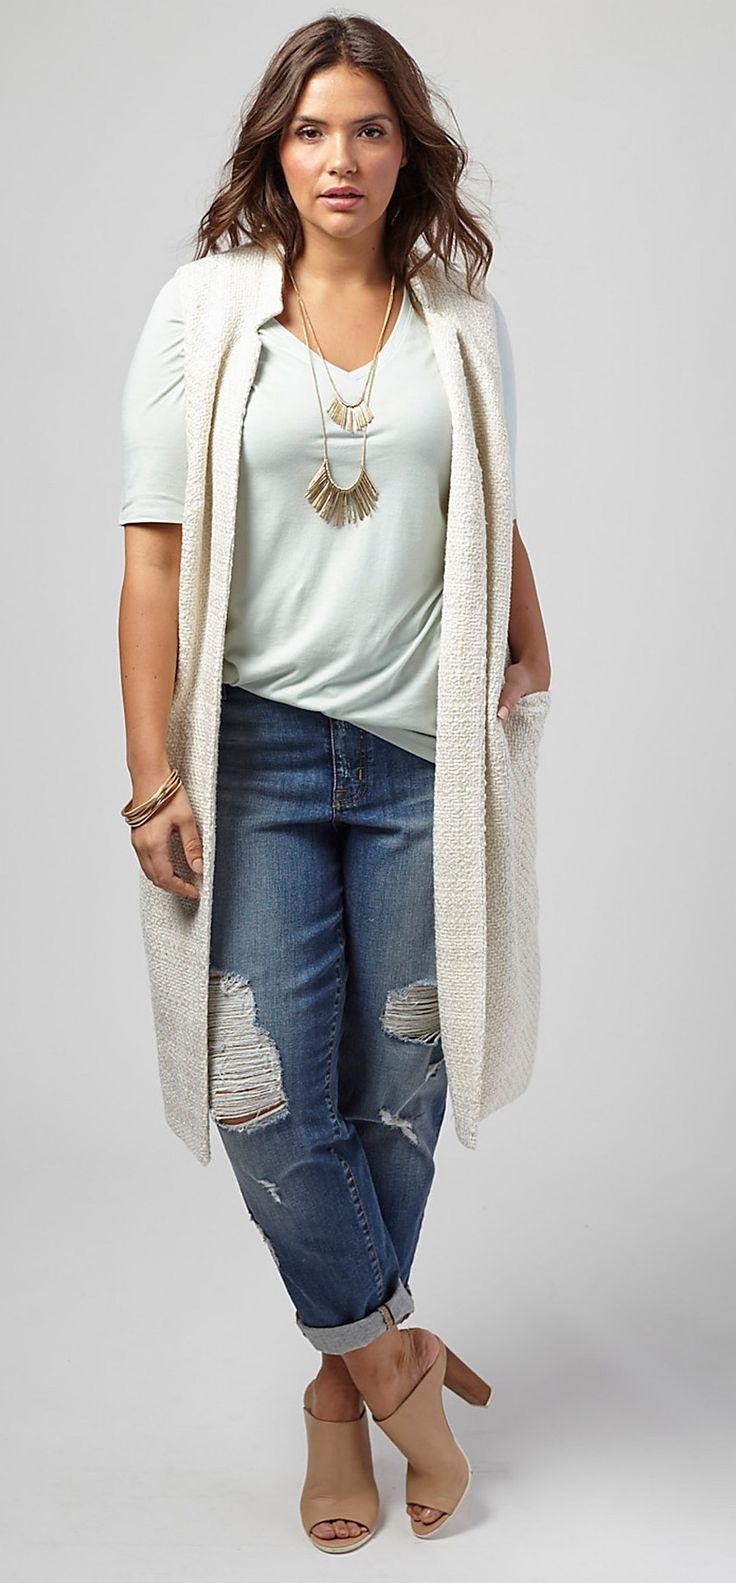 Resultado de imagen para fashion jeans plus size